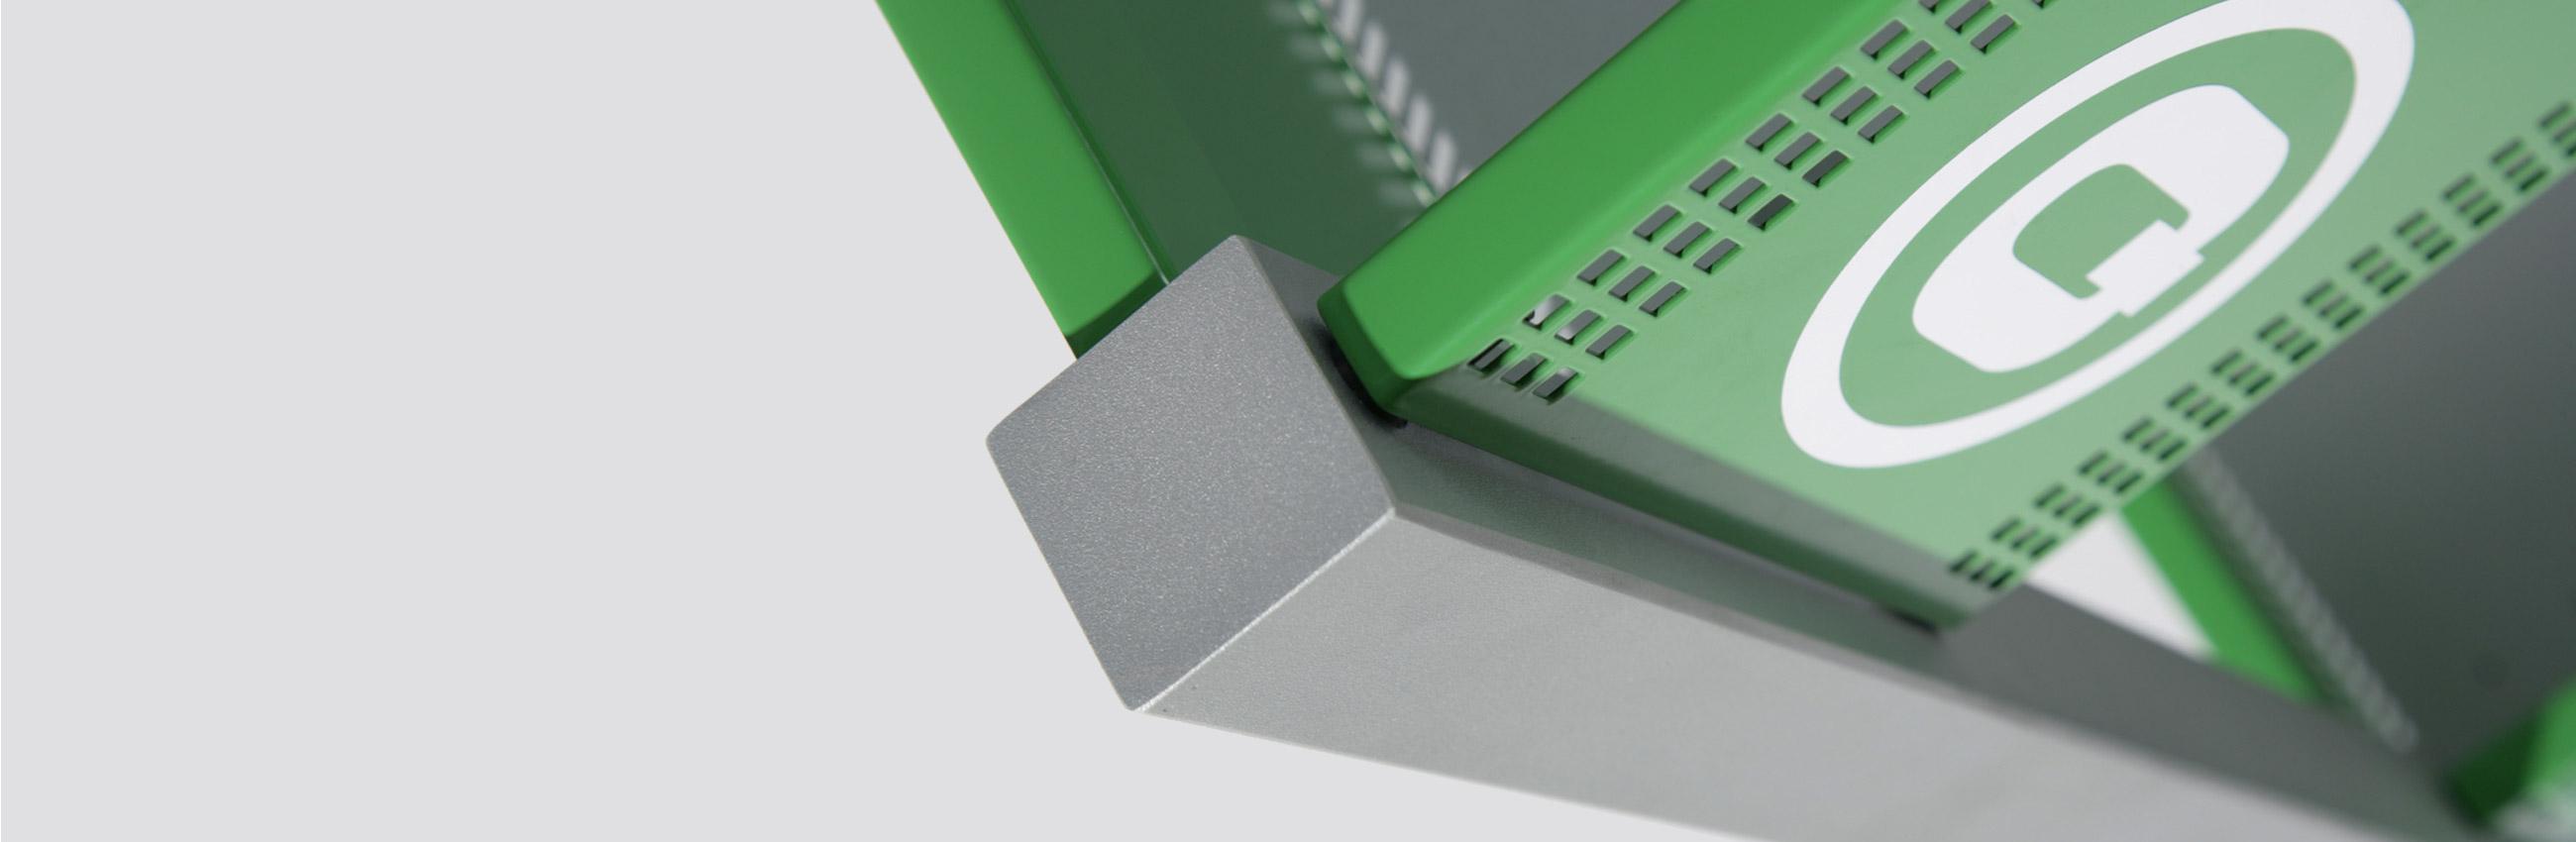 Quickschuh Displayständer